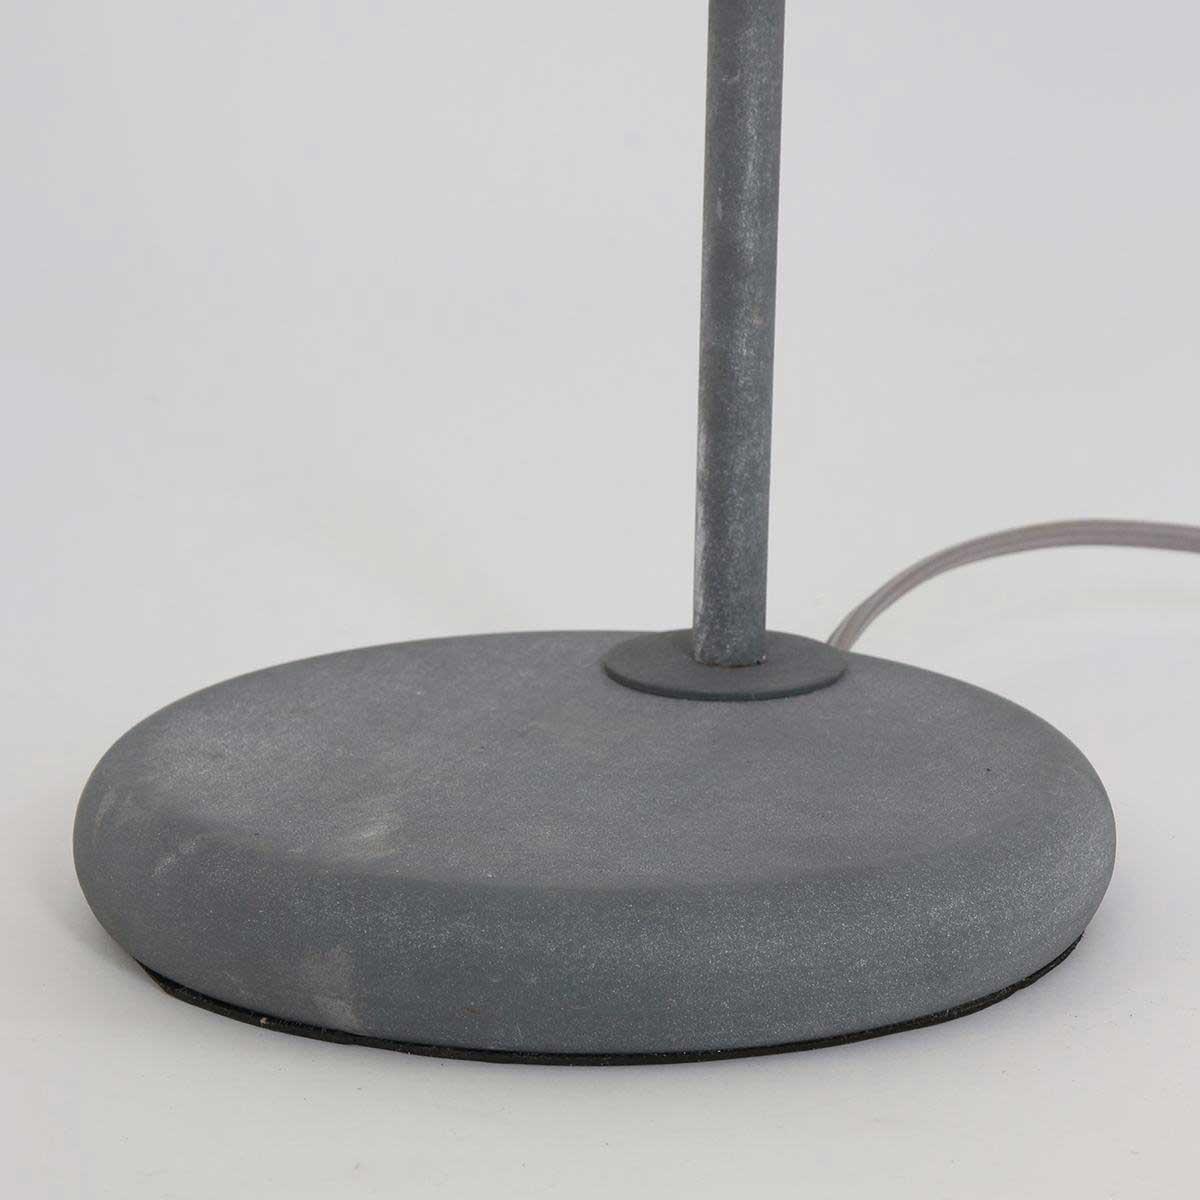 Tafellamp 1 lichts beton MEXLITE